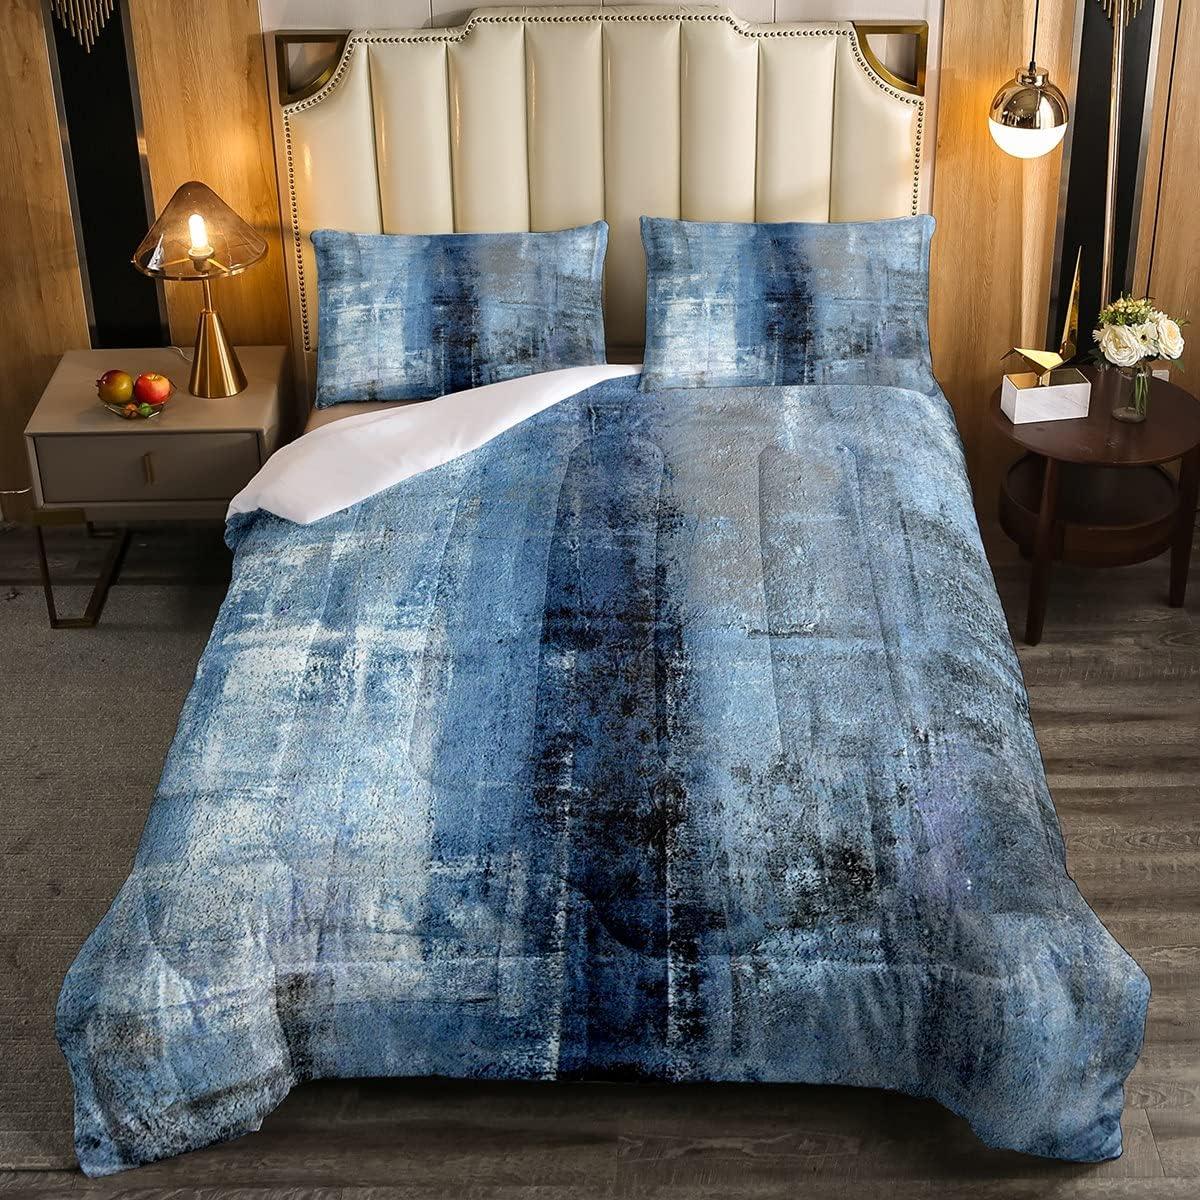 Erosebridal Cheap mail order specialty store Tie Ranking TOP12 Dye Comforter Set Kids Q Bedding Marble for